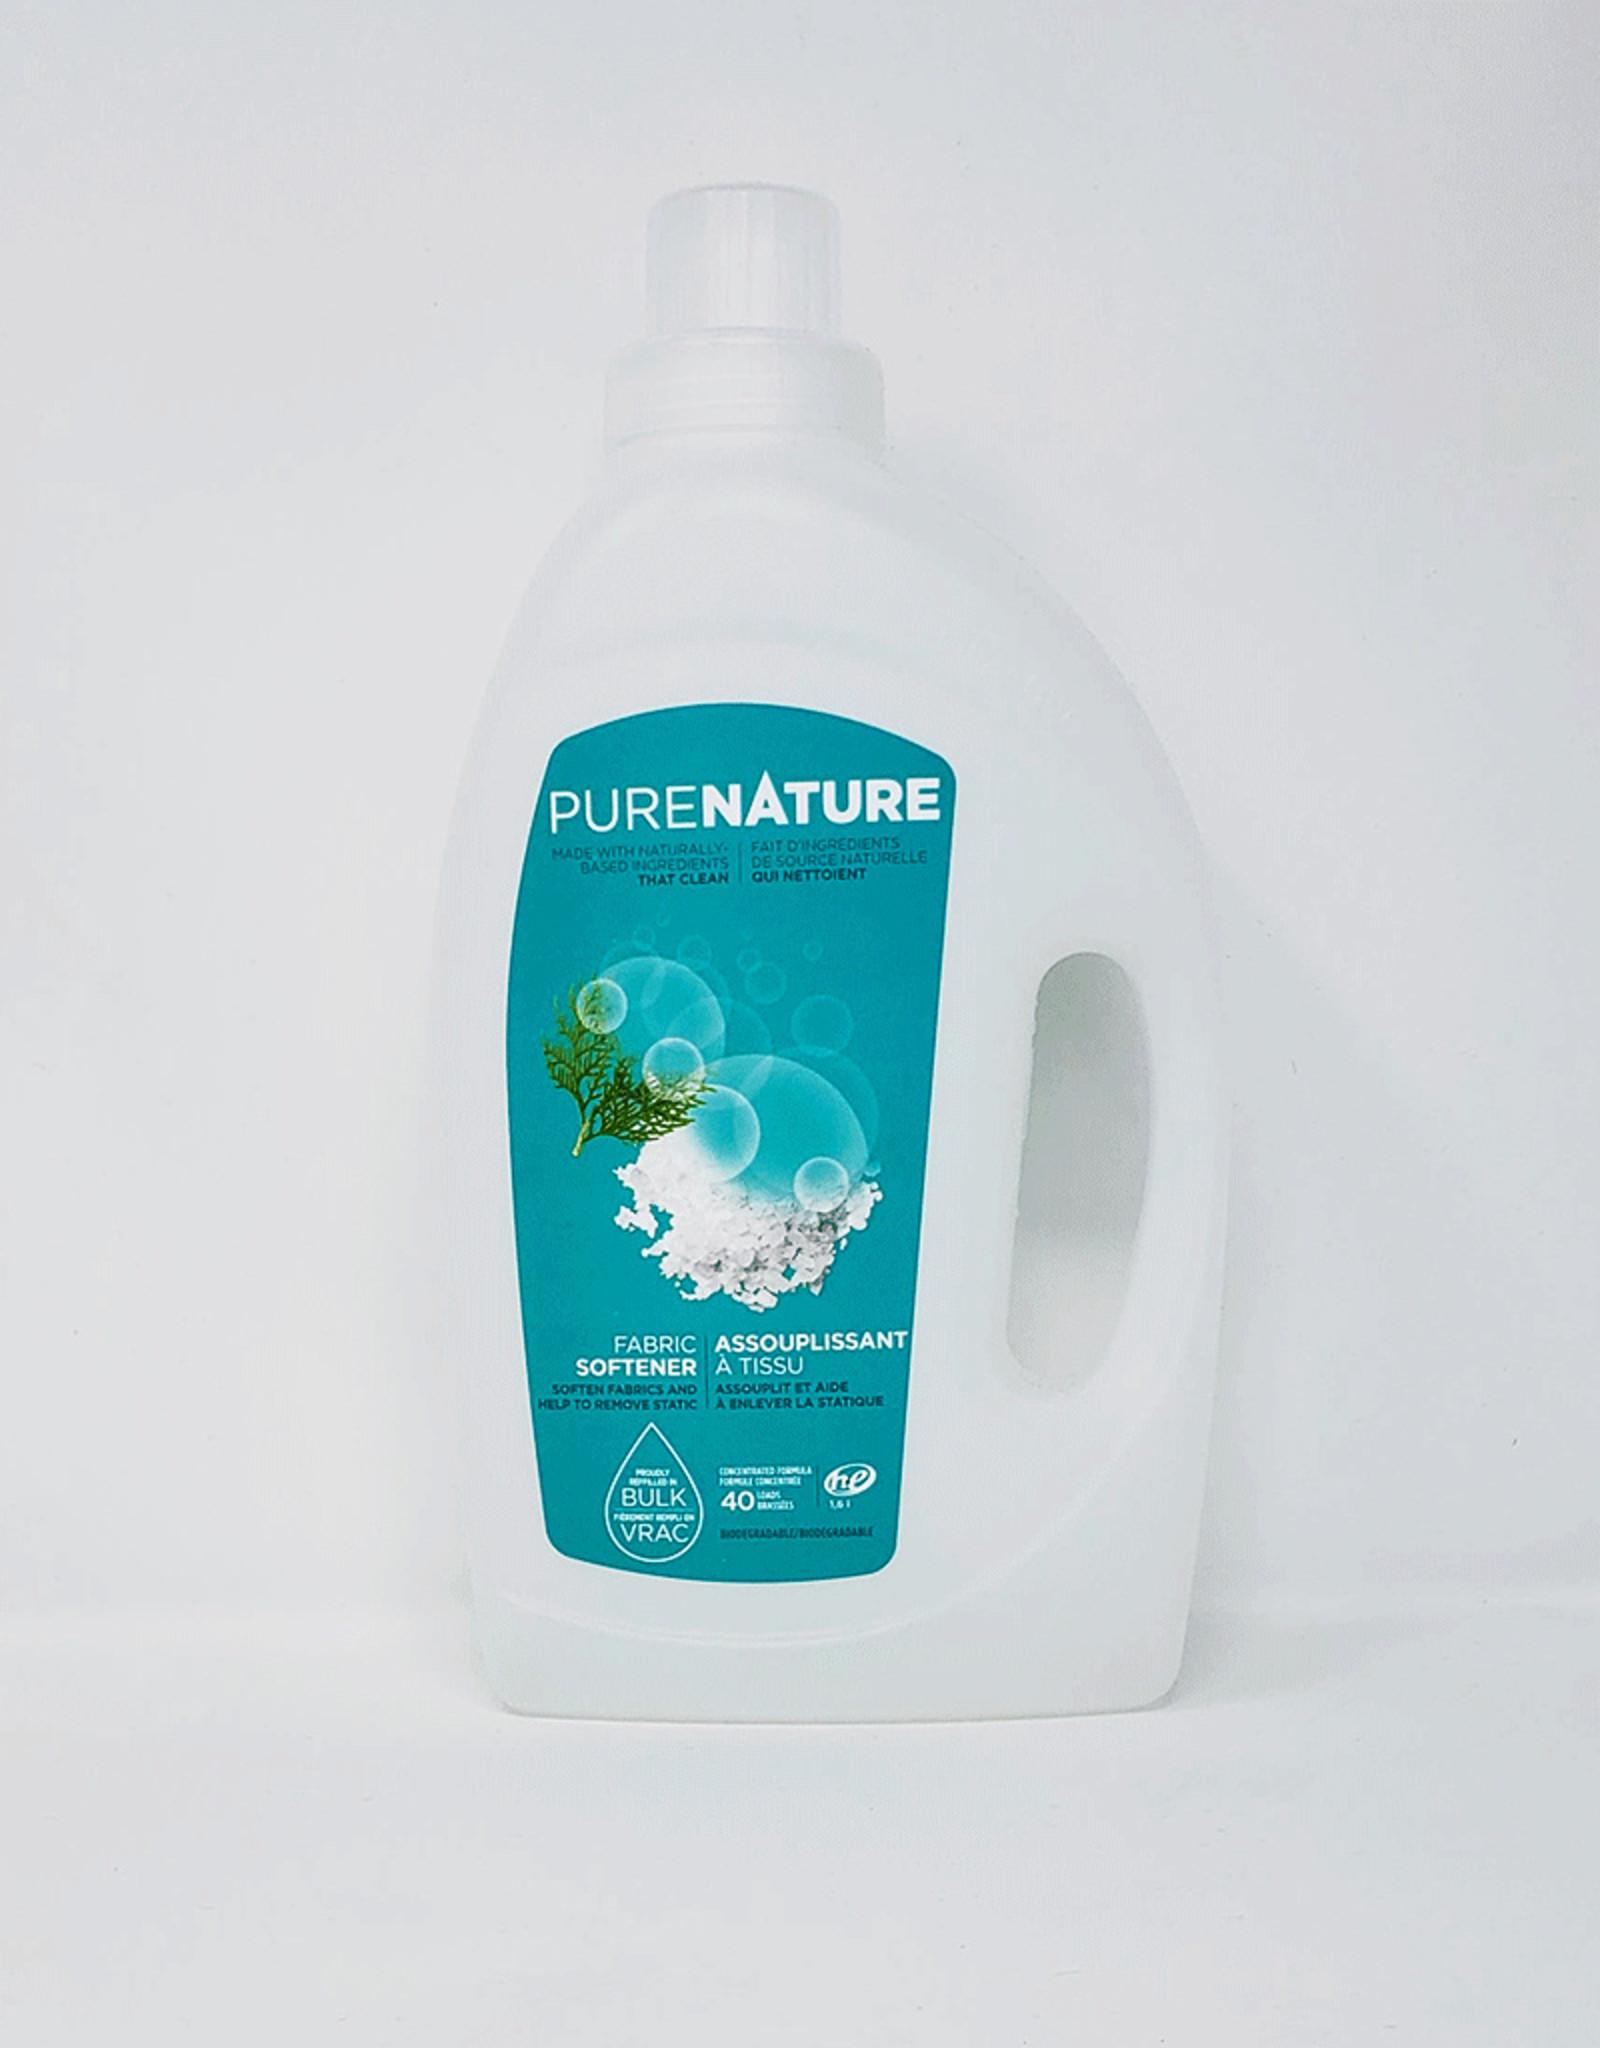 Purenature Purenature - Empty Bottle, Fabric Softener (1.6L)